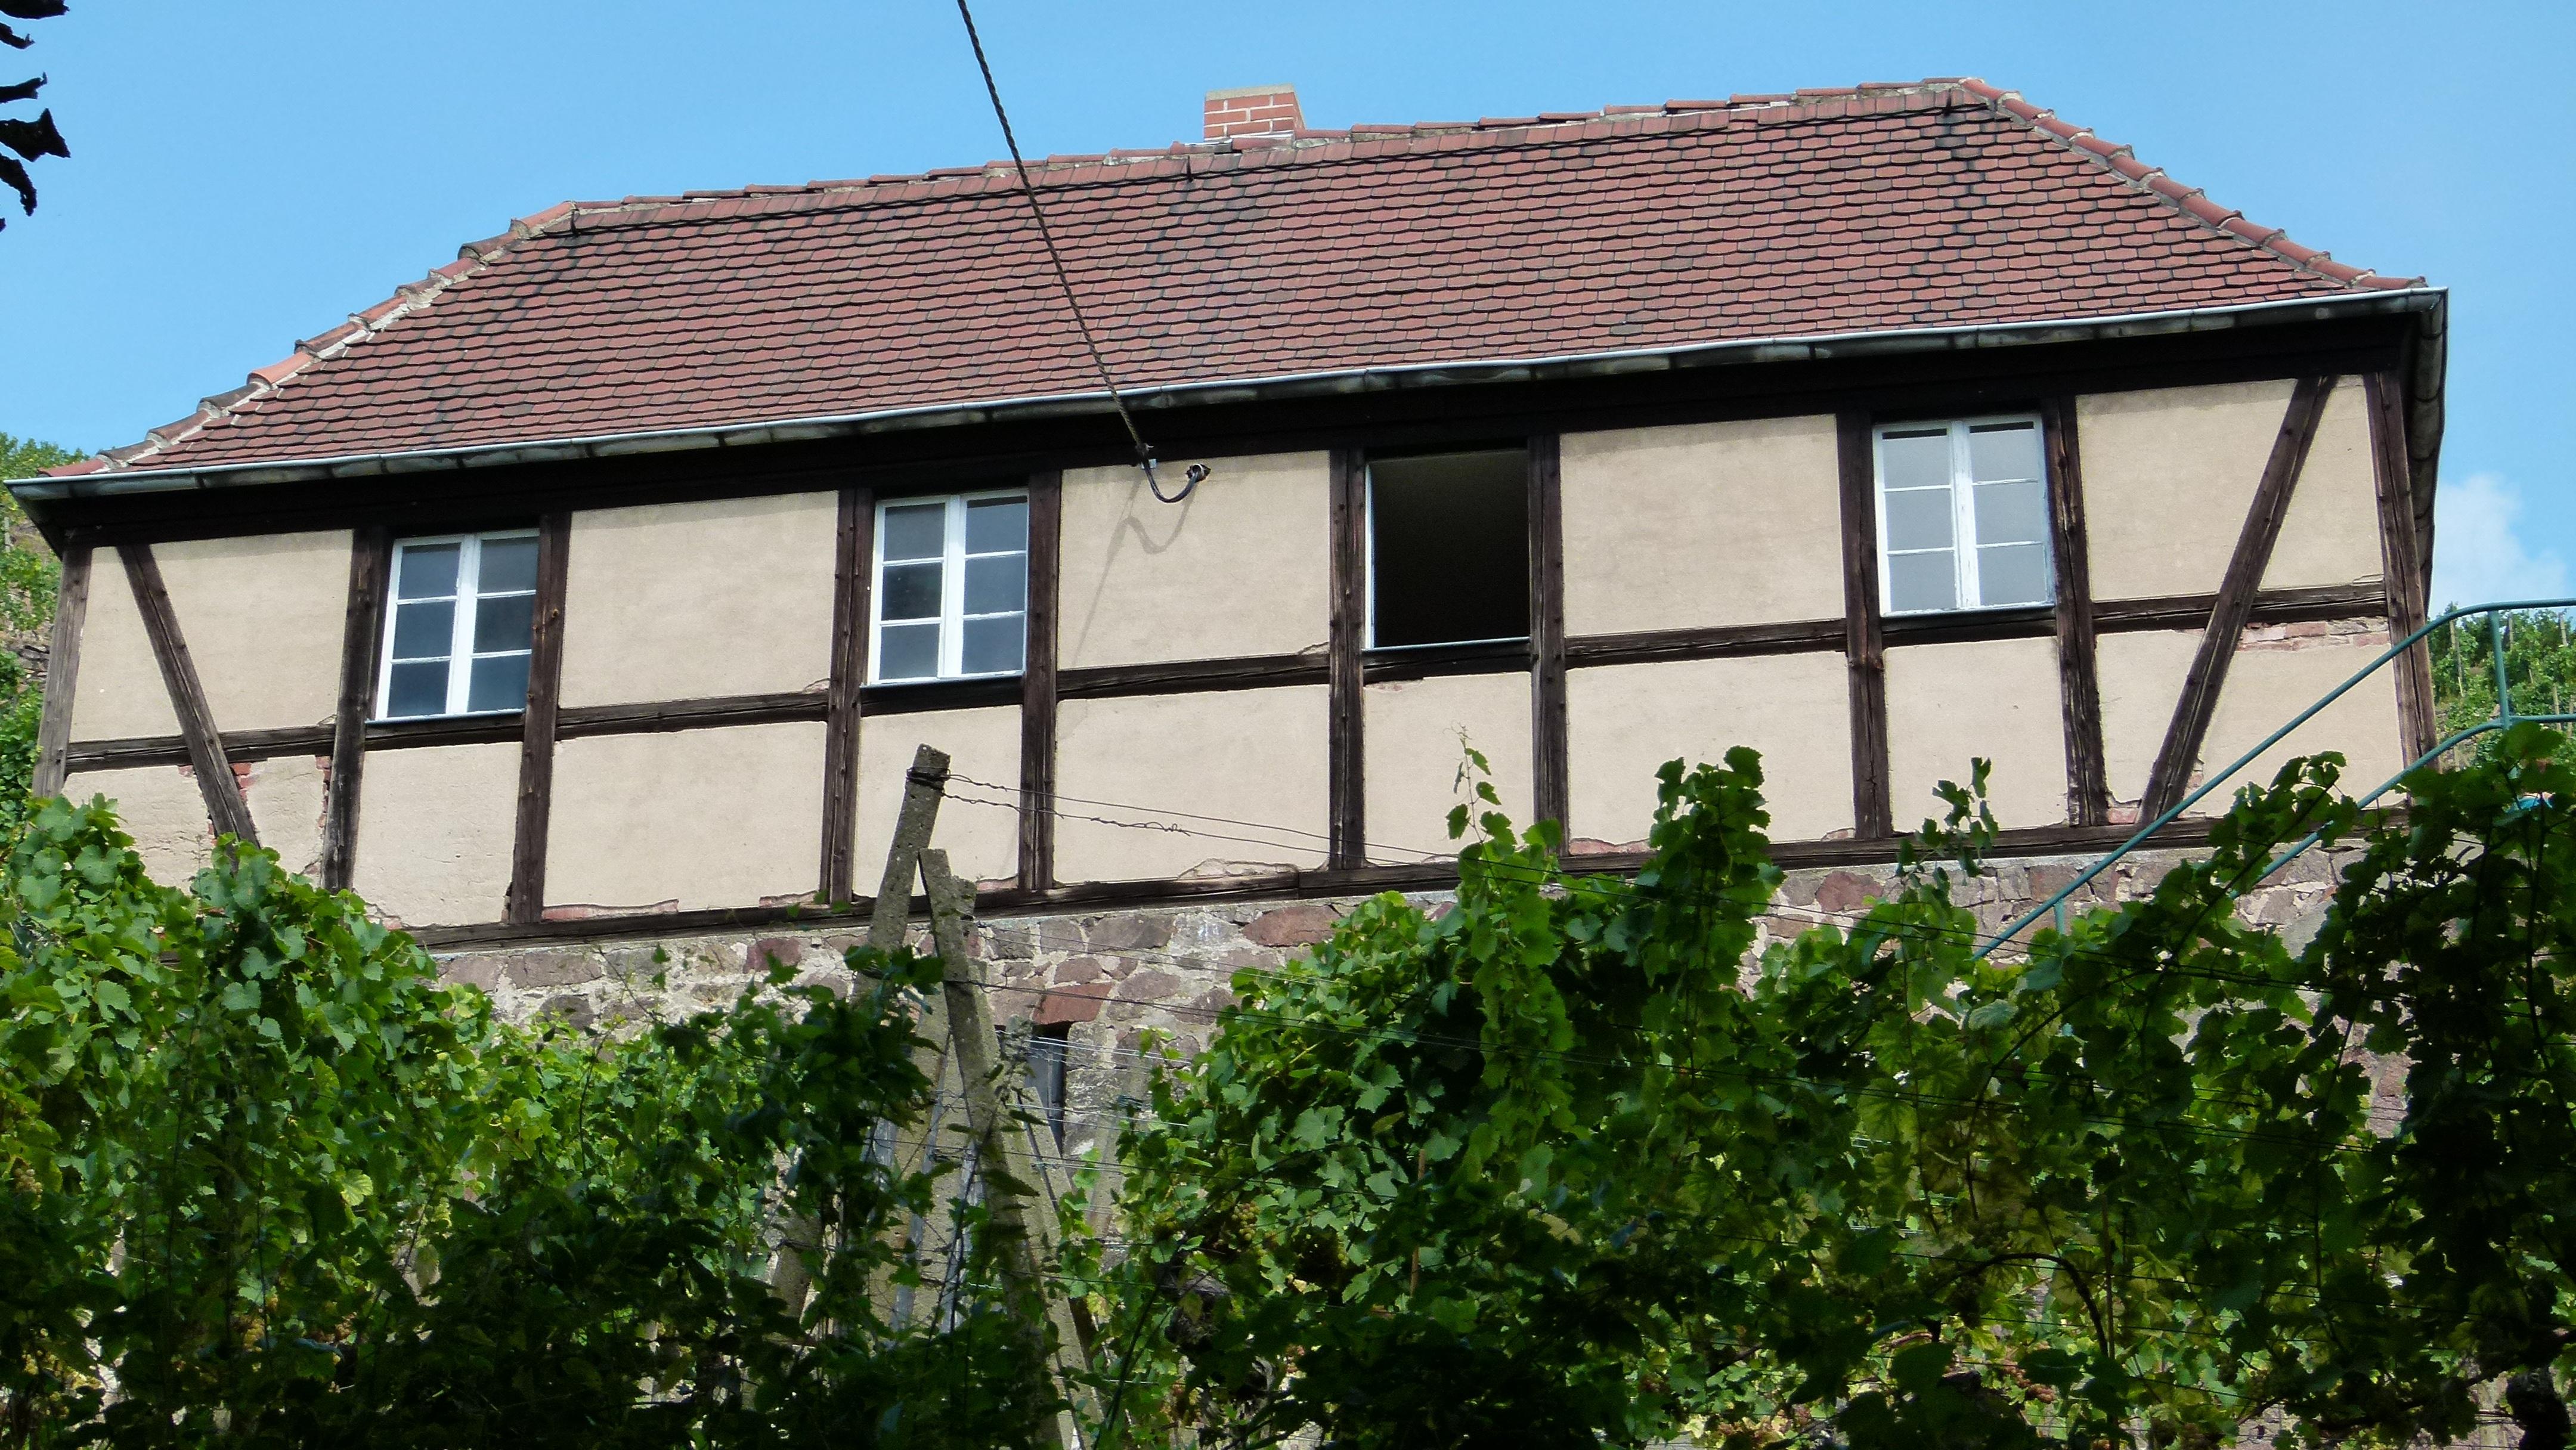 Fotos gratis : arquitectura, villa, casa, ventana, techo, edificio ...